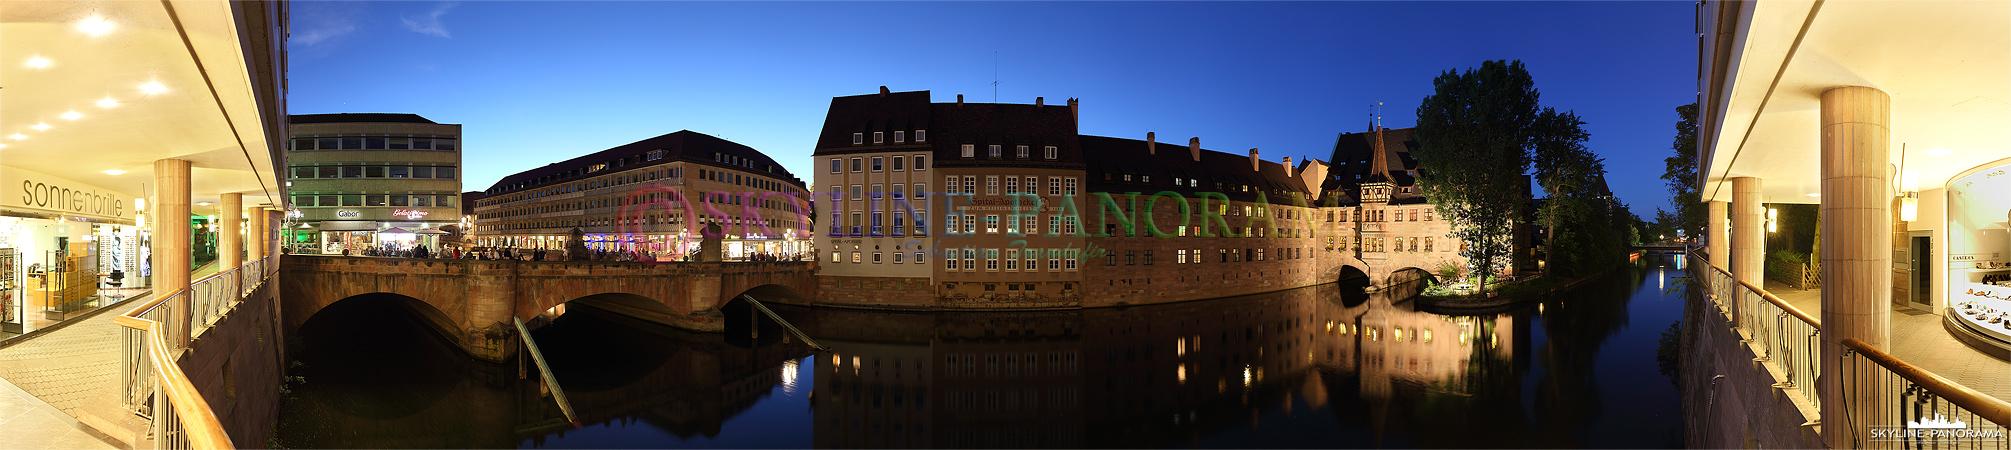 Heilig Geist Spital - Panorama Nürnberg